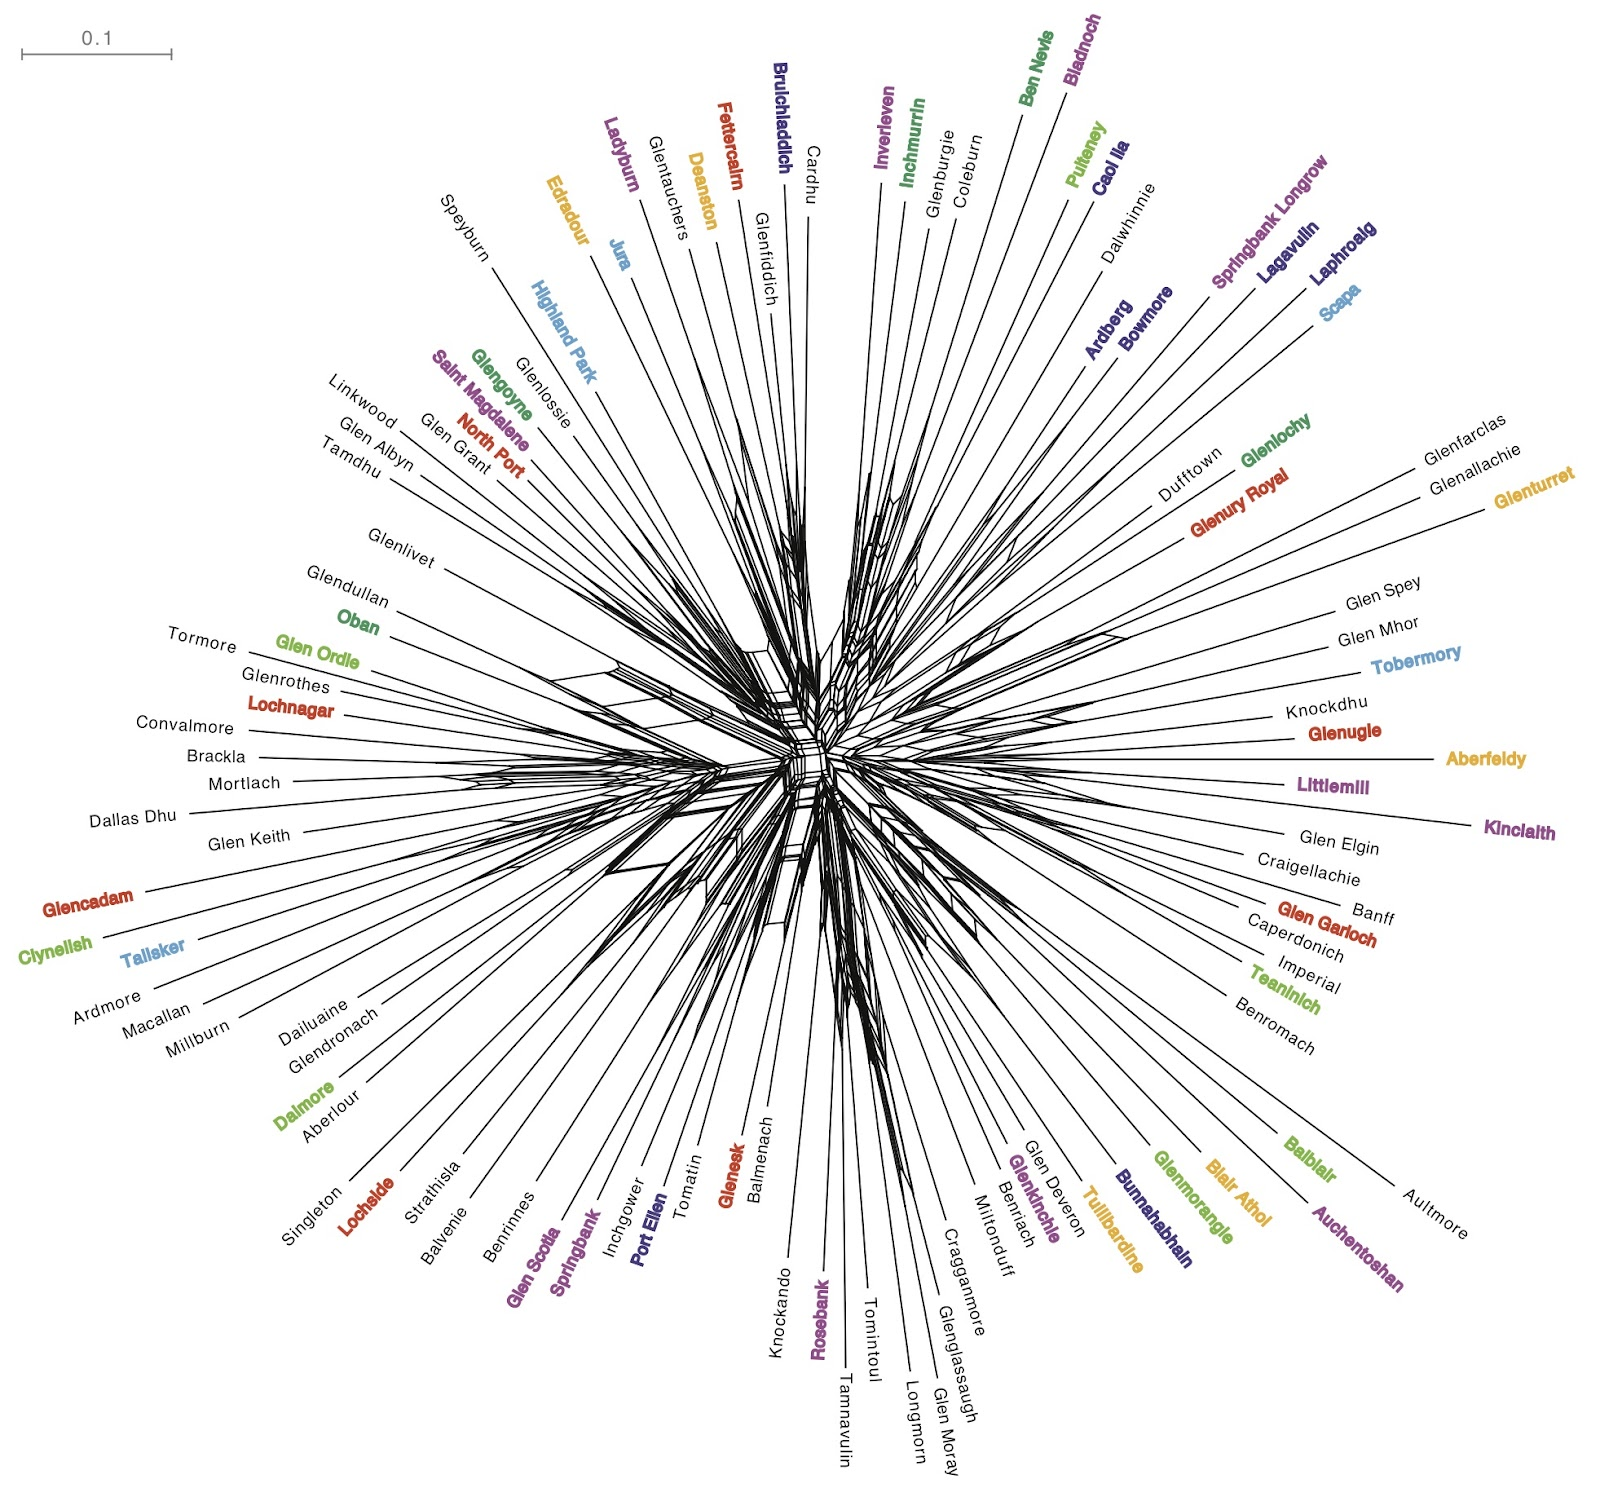 The Genealogical World Of Phylogenetic Networks Network